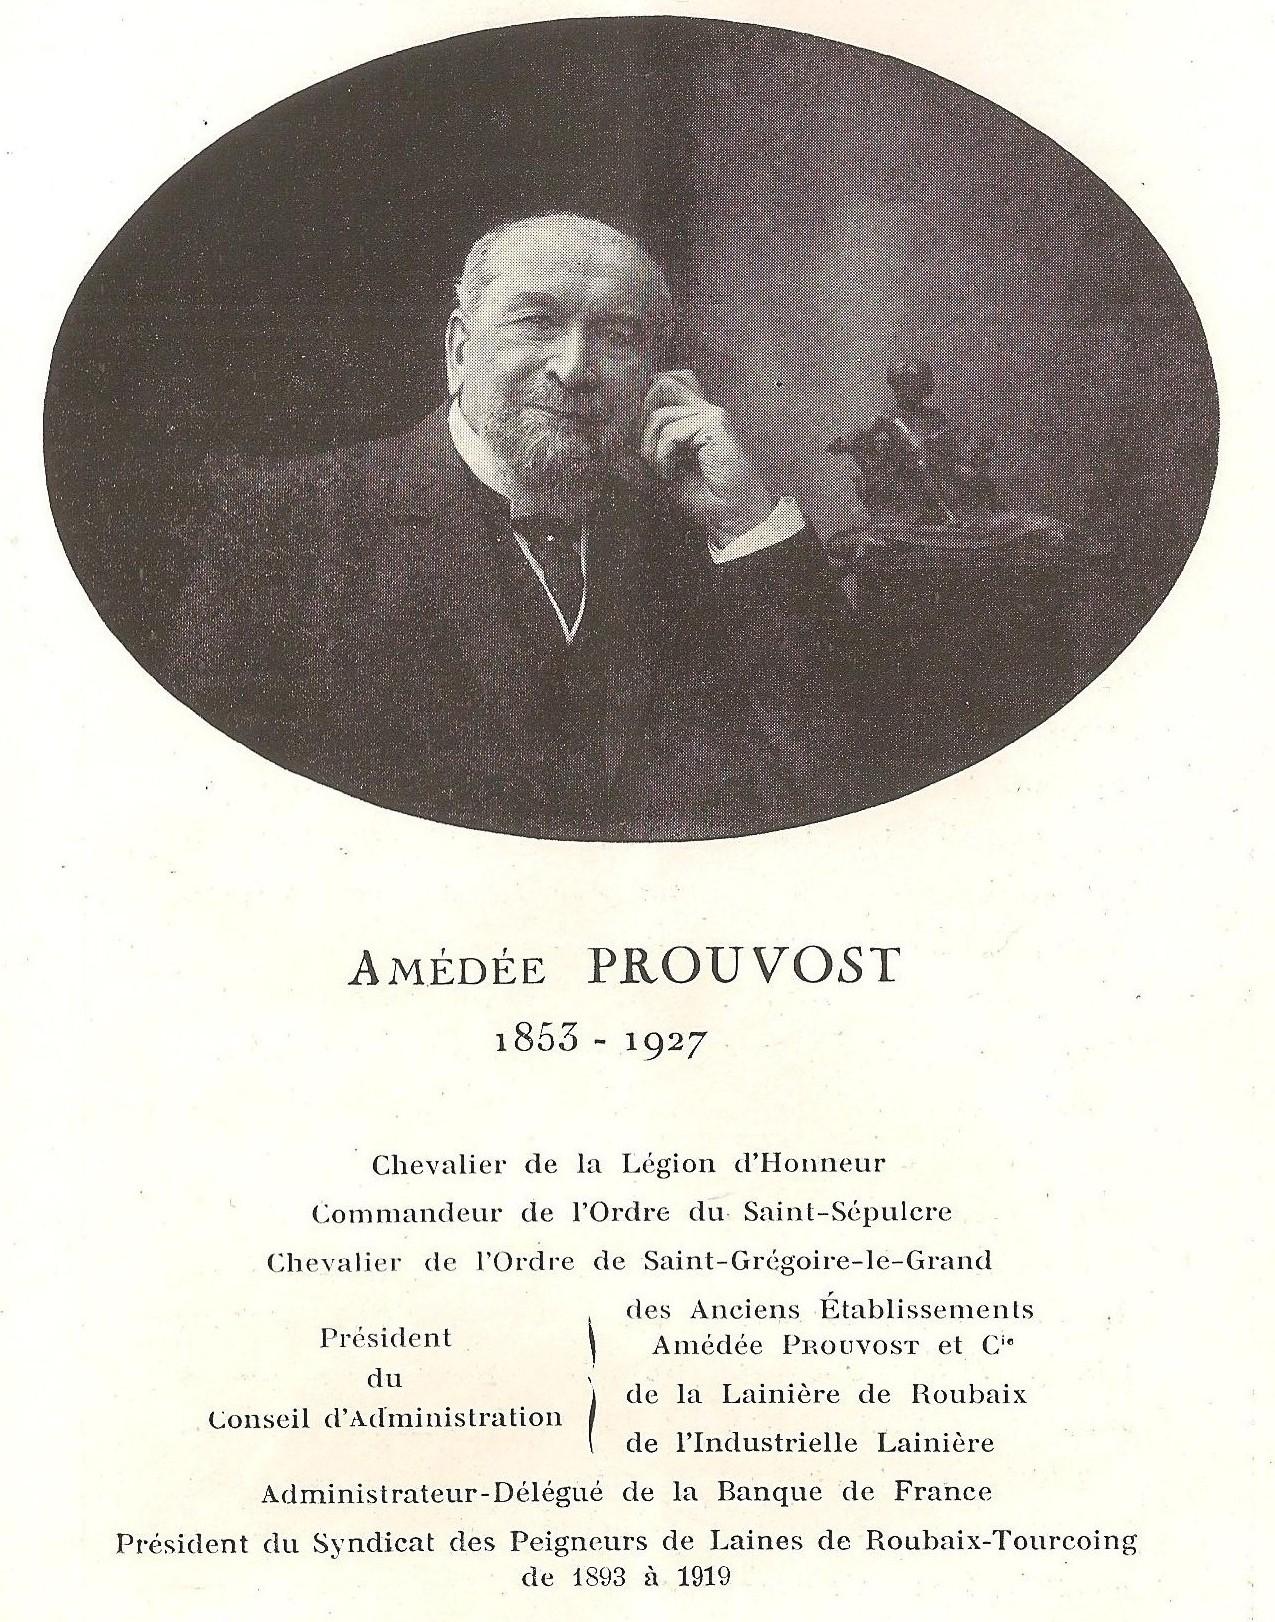 Amedee-II-Prouvost